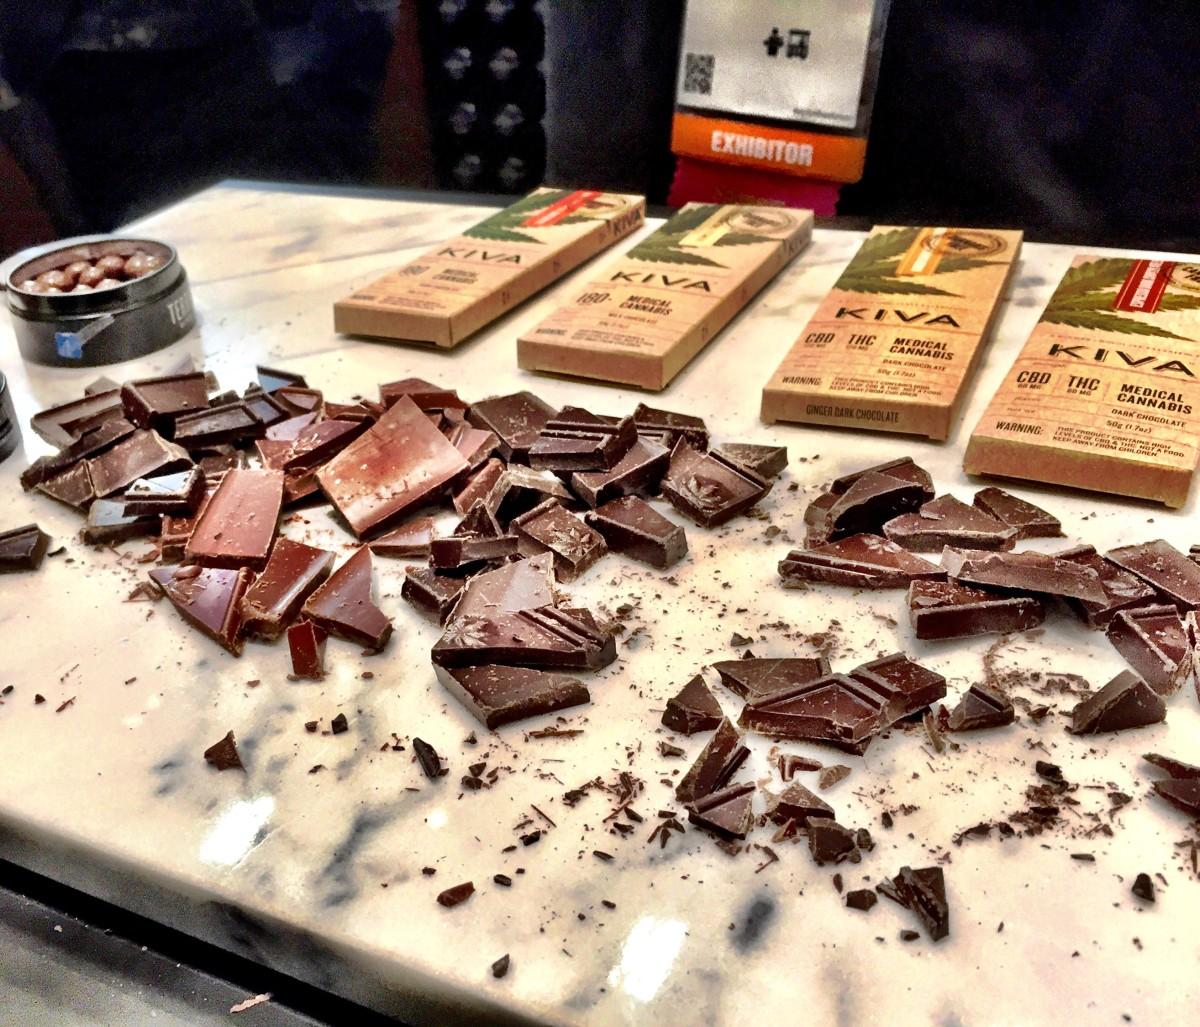 Kiva chocolate samples... delicious.